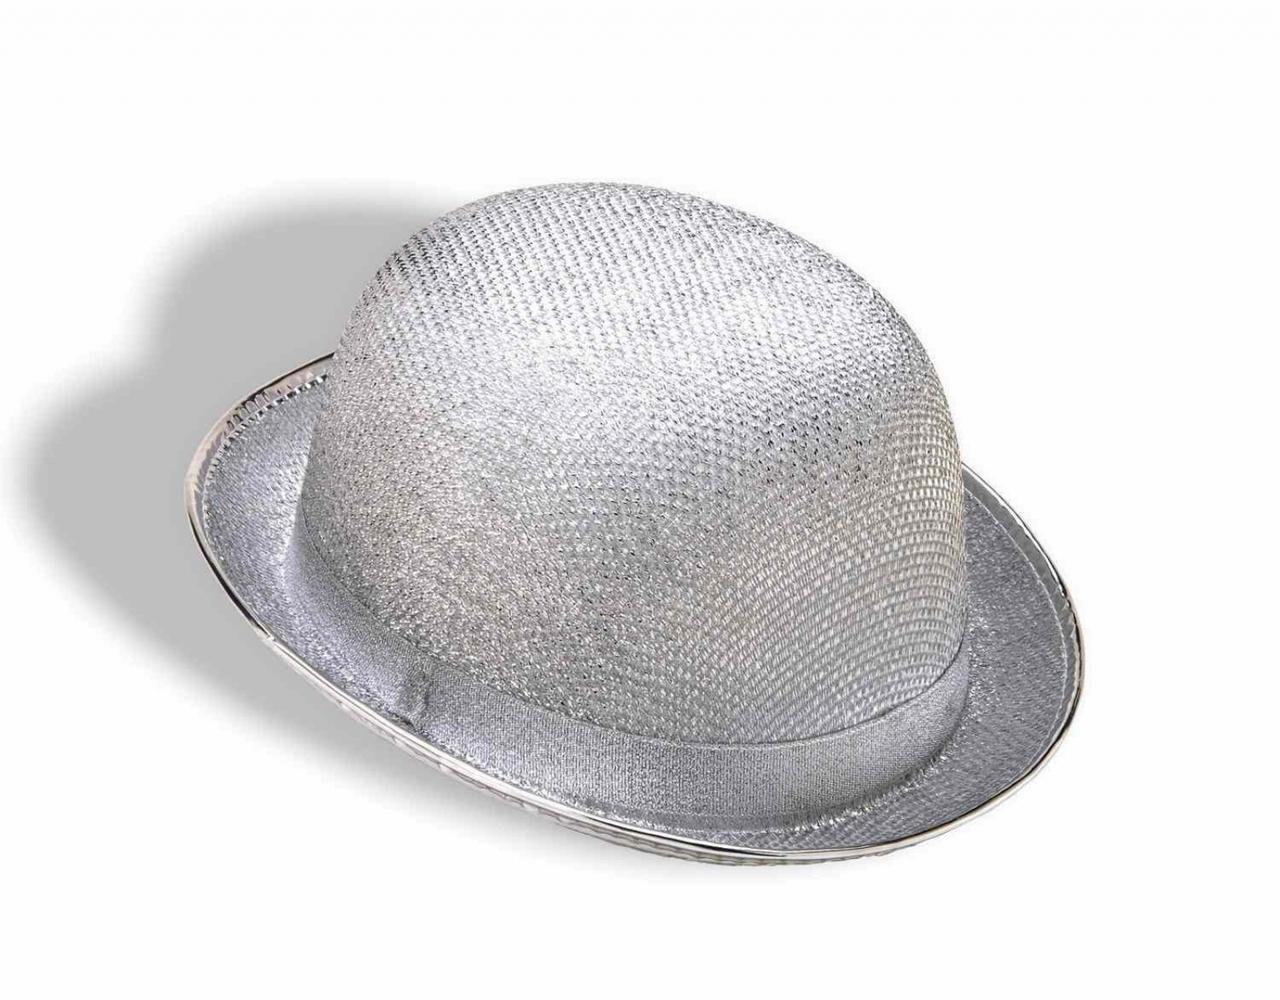 cf92fb2a0ffd9 Silver Glittery Bowler Hat - The Costume Shoppe